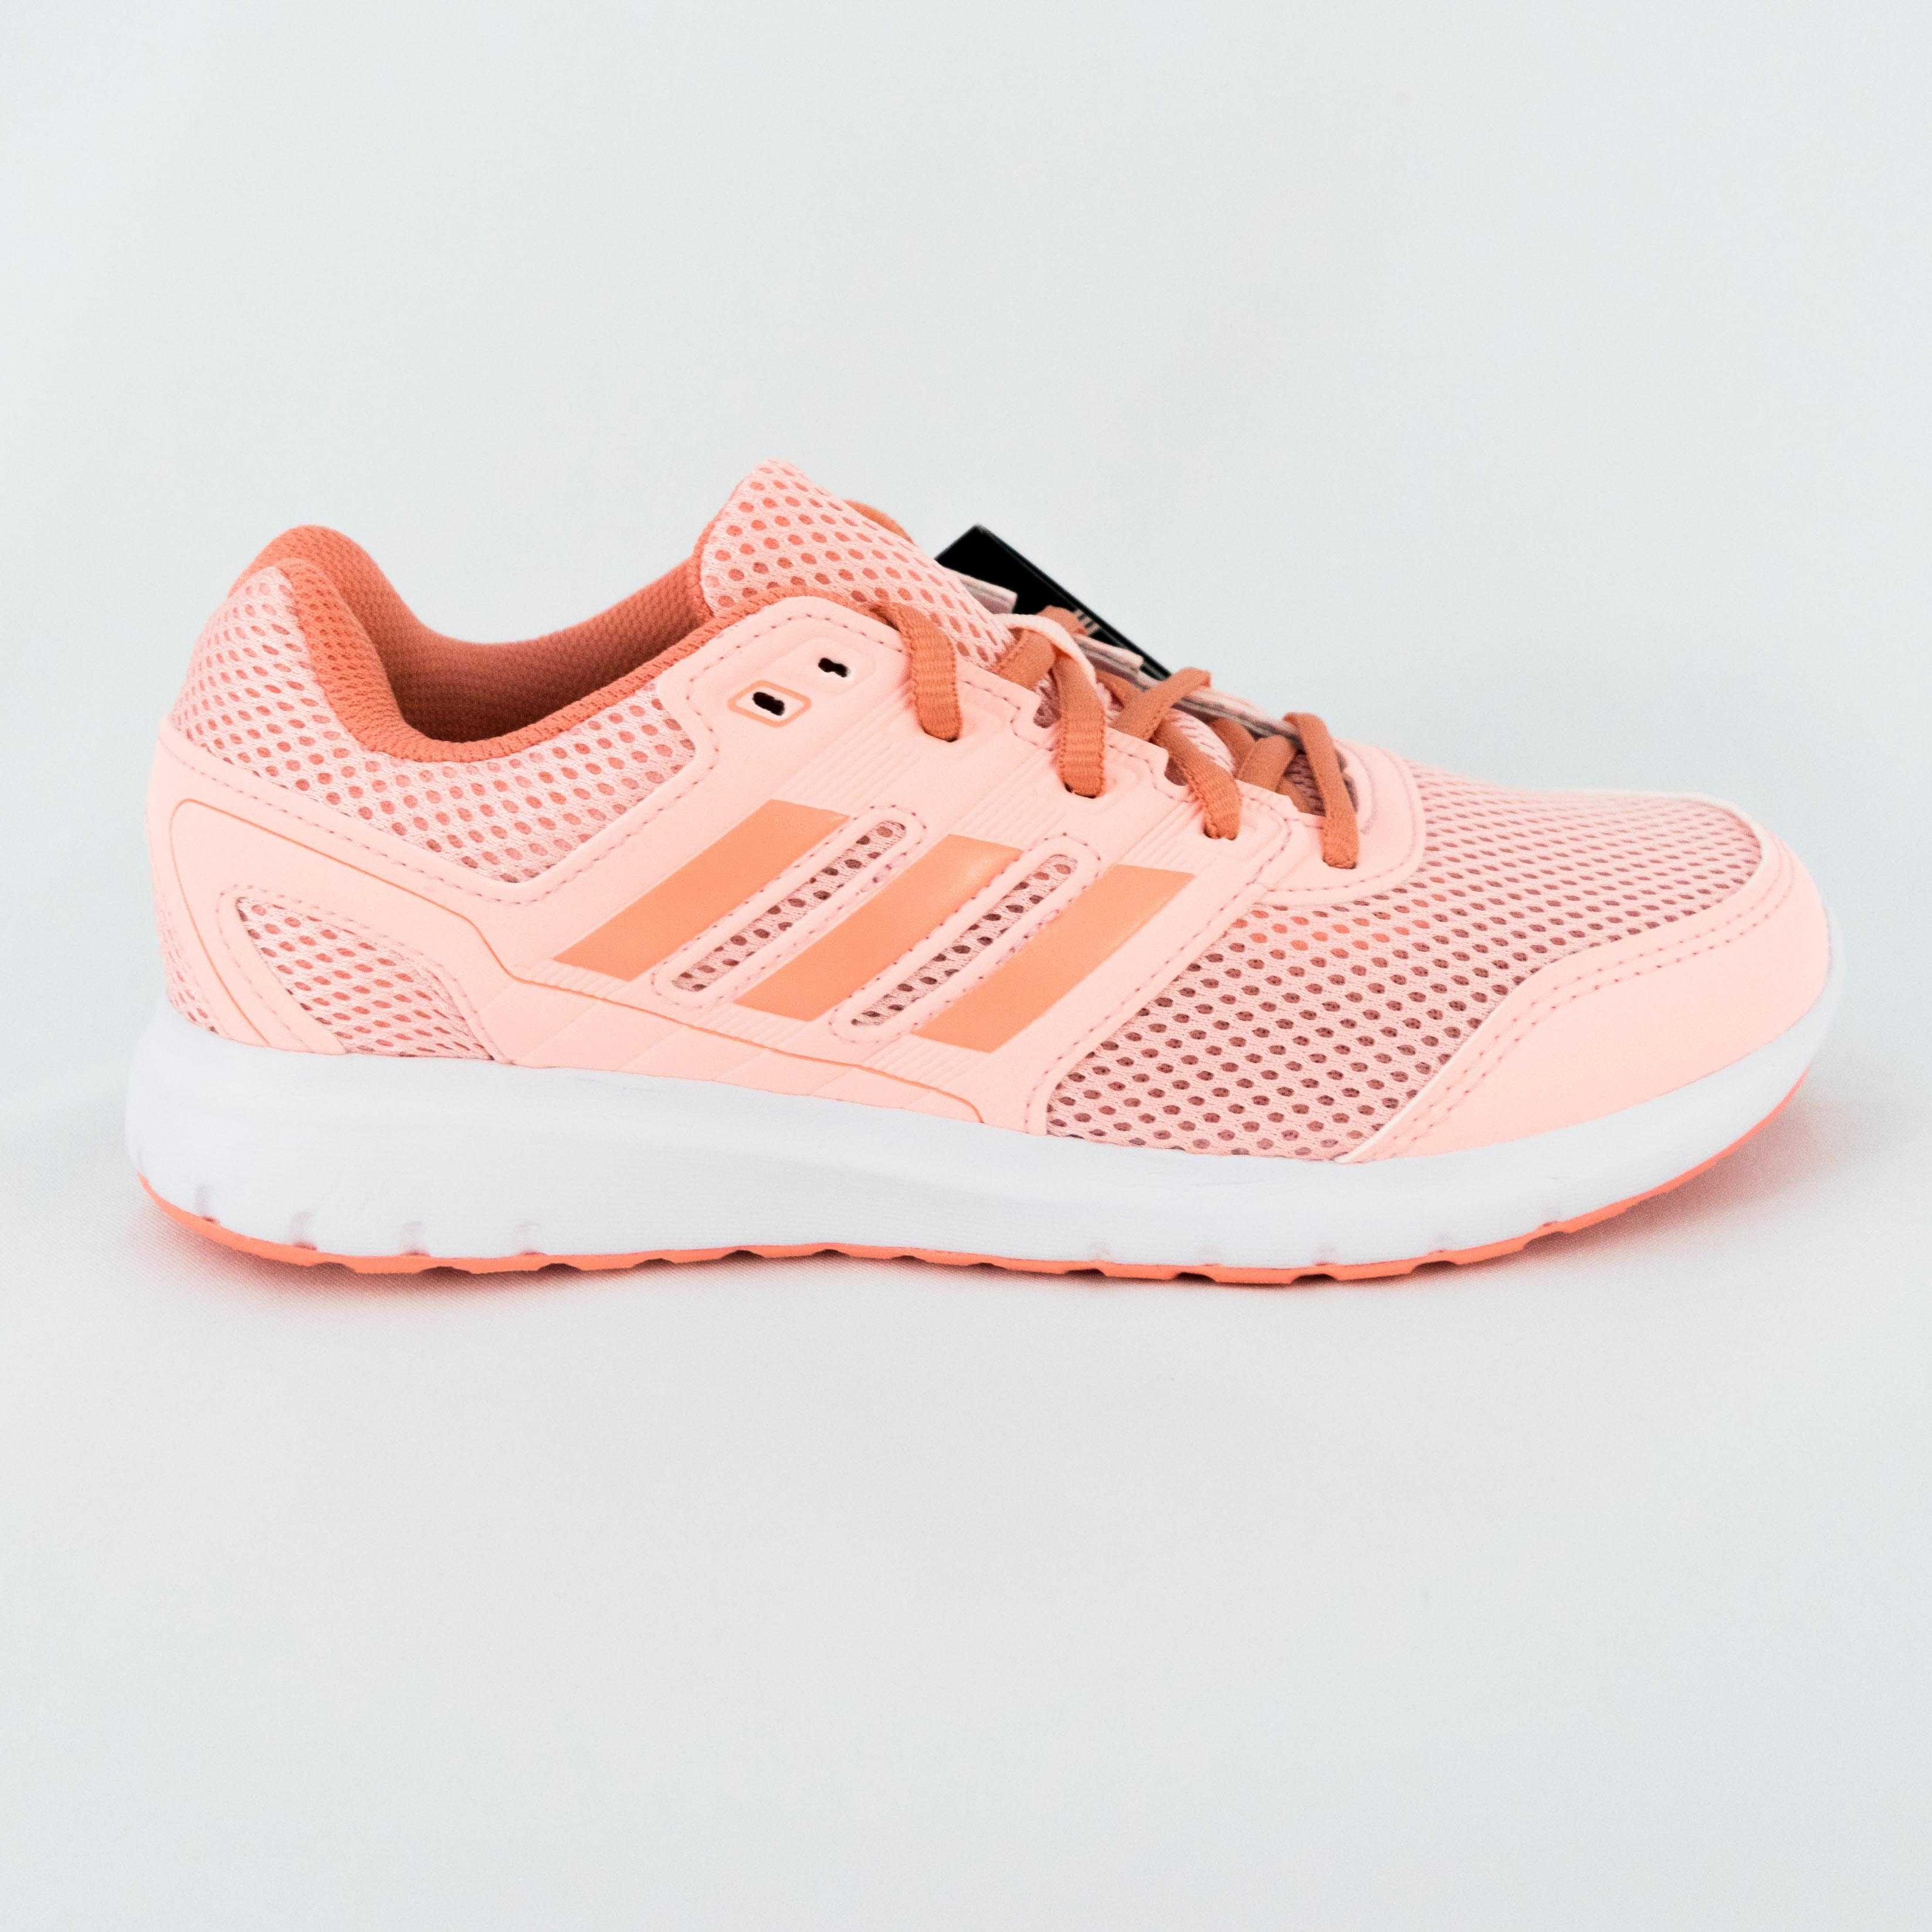 51b26a1c3b Tênis Adidas Duramo Lite 2 Rosa Bebê